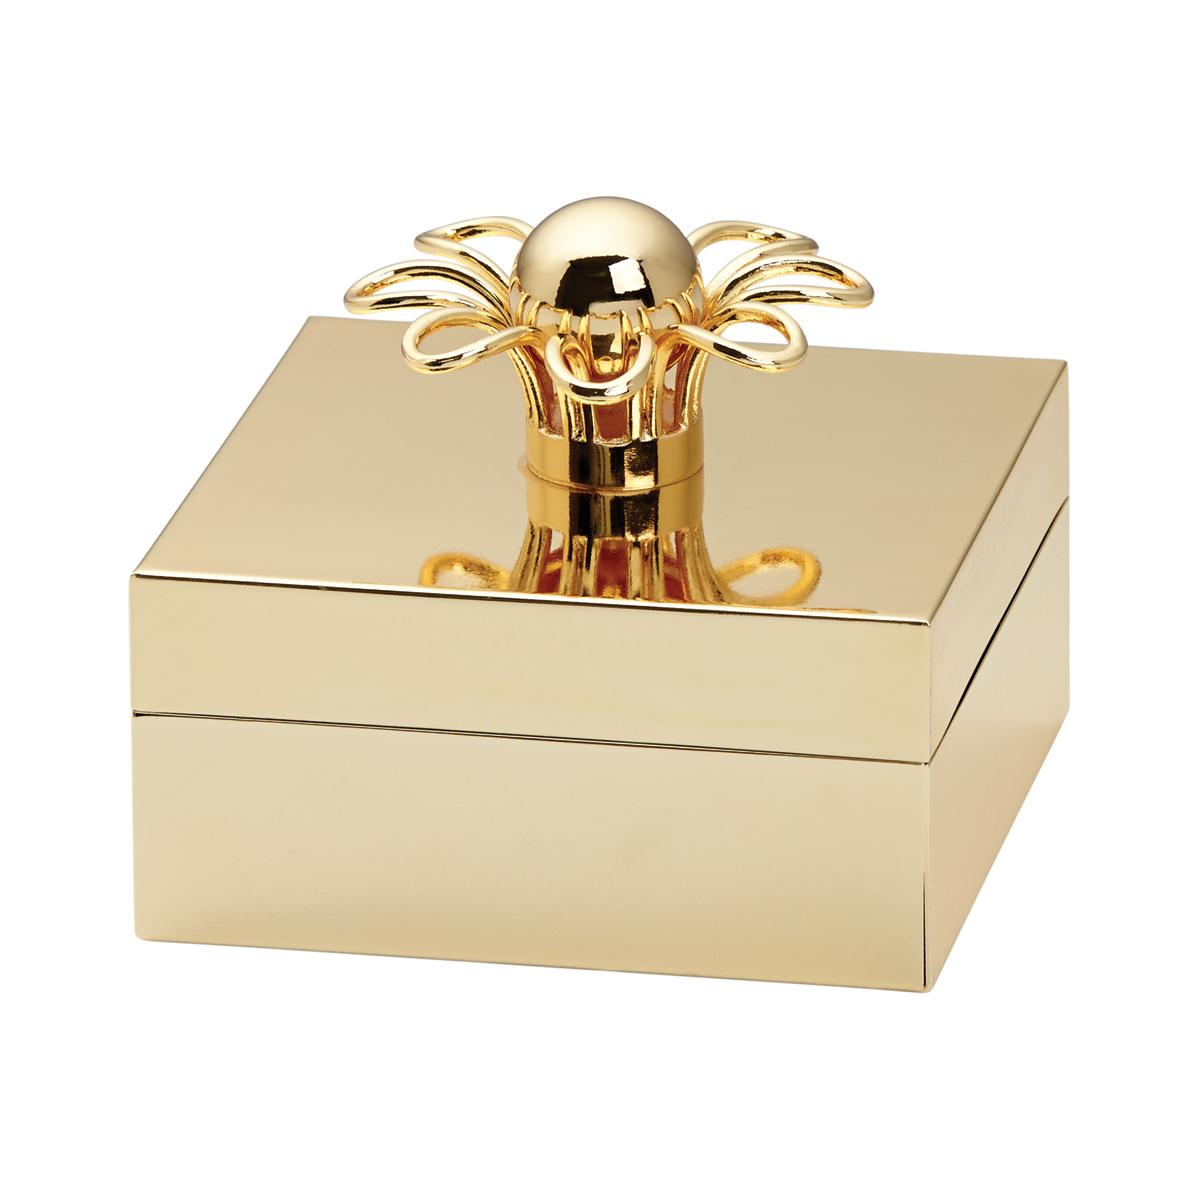 Kate Spade New York, Lenox Keaton St Metal Jewelry Box Gold